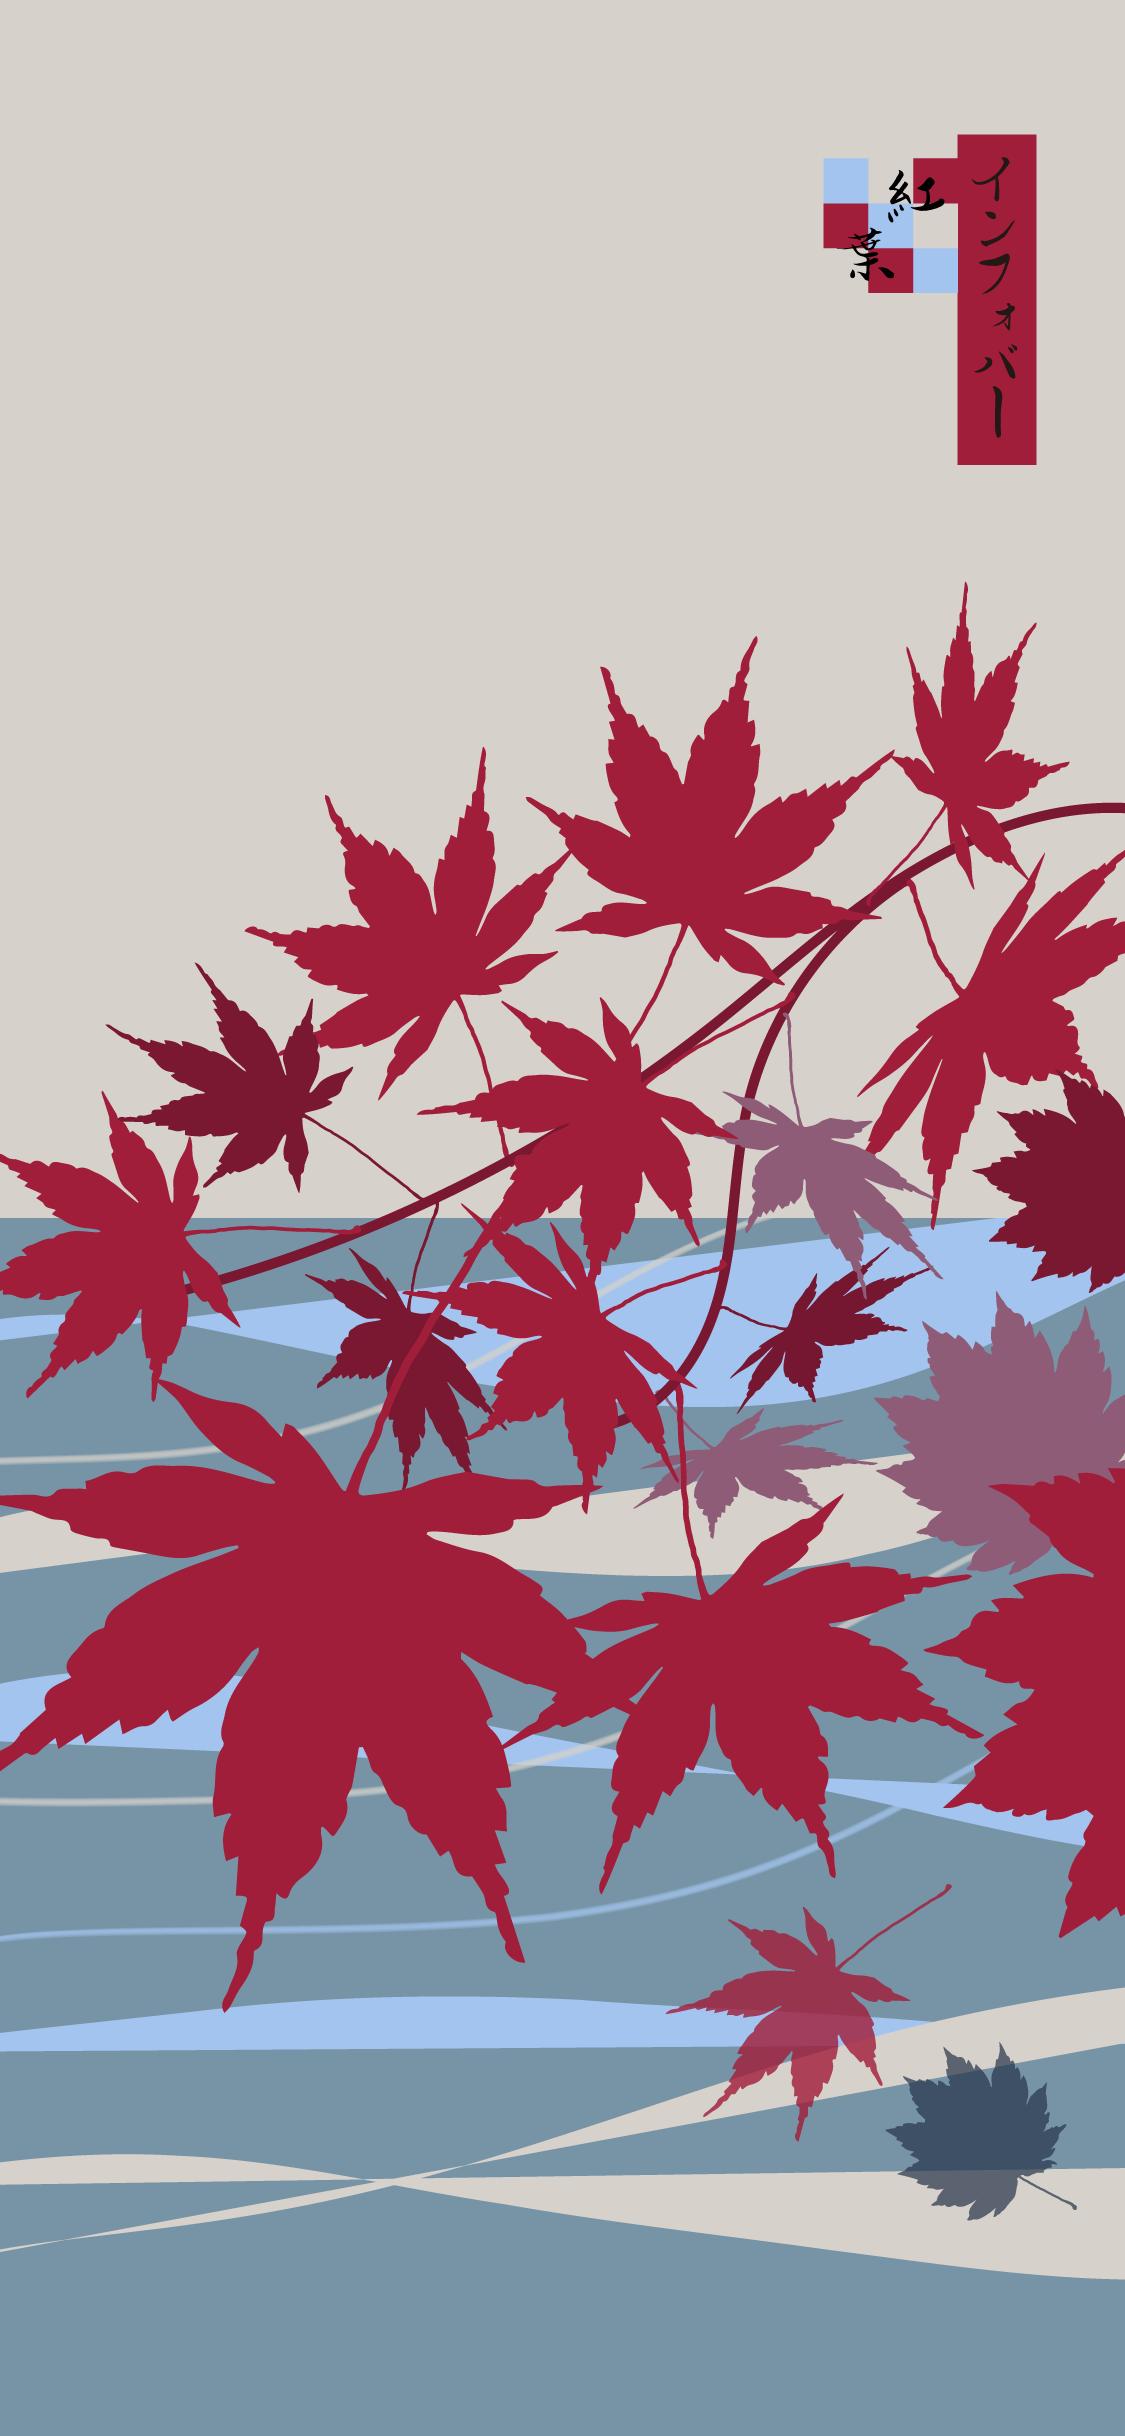 iPhone X, Xs, XR, 11, 11 Pro用壁紙 | 紅葉(昼)(1125x2436)